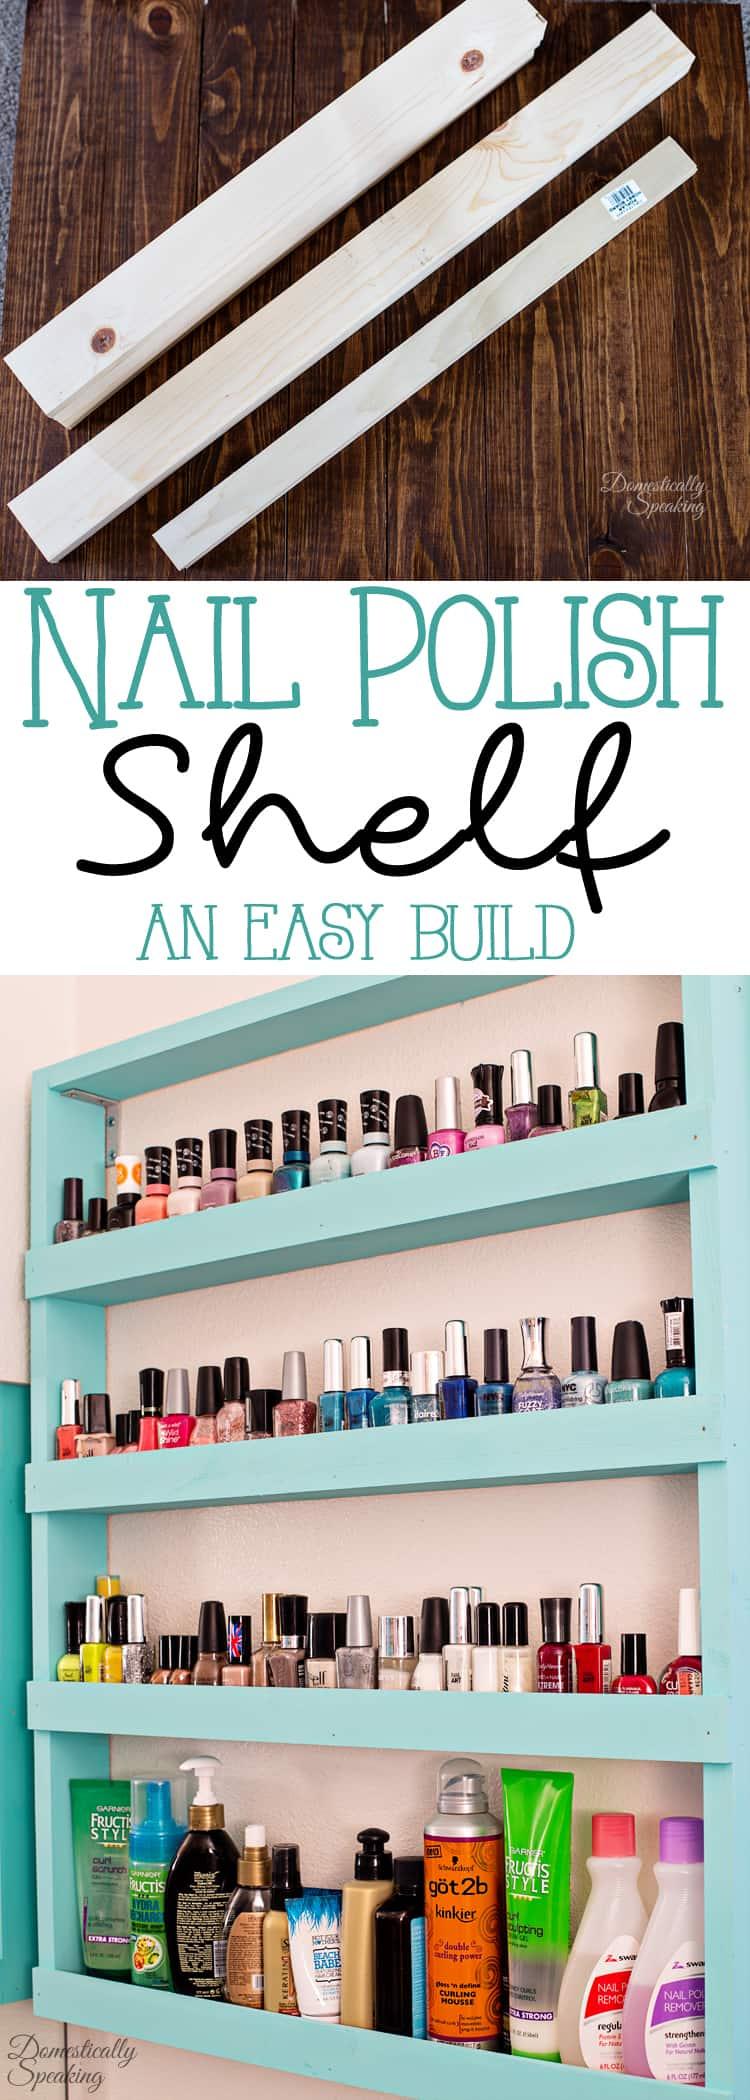 Nail Polish Shelf an Easy Build great way to organize your bathroom.